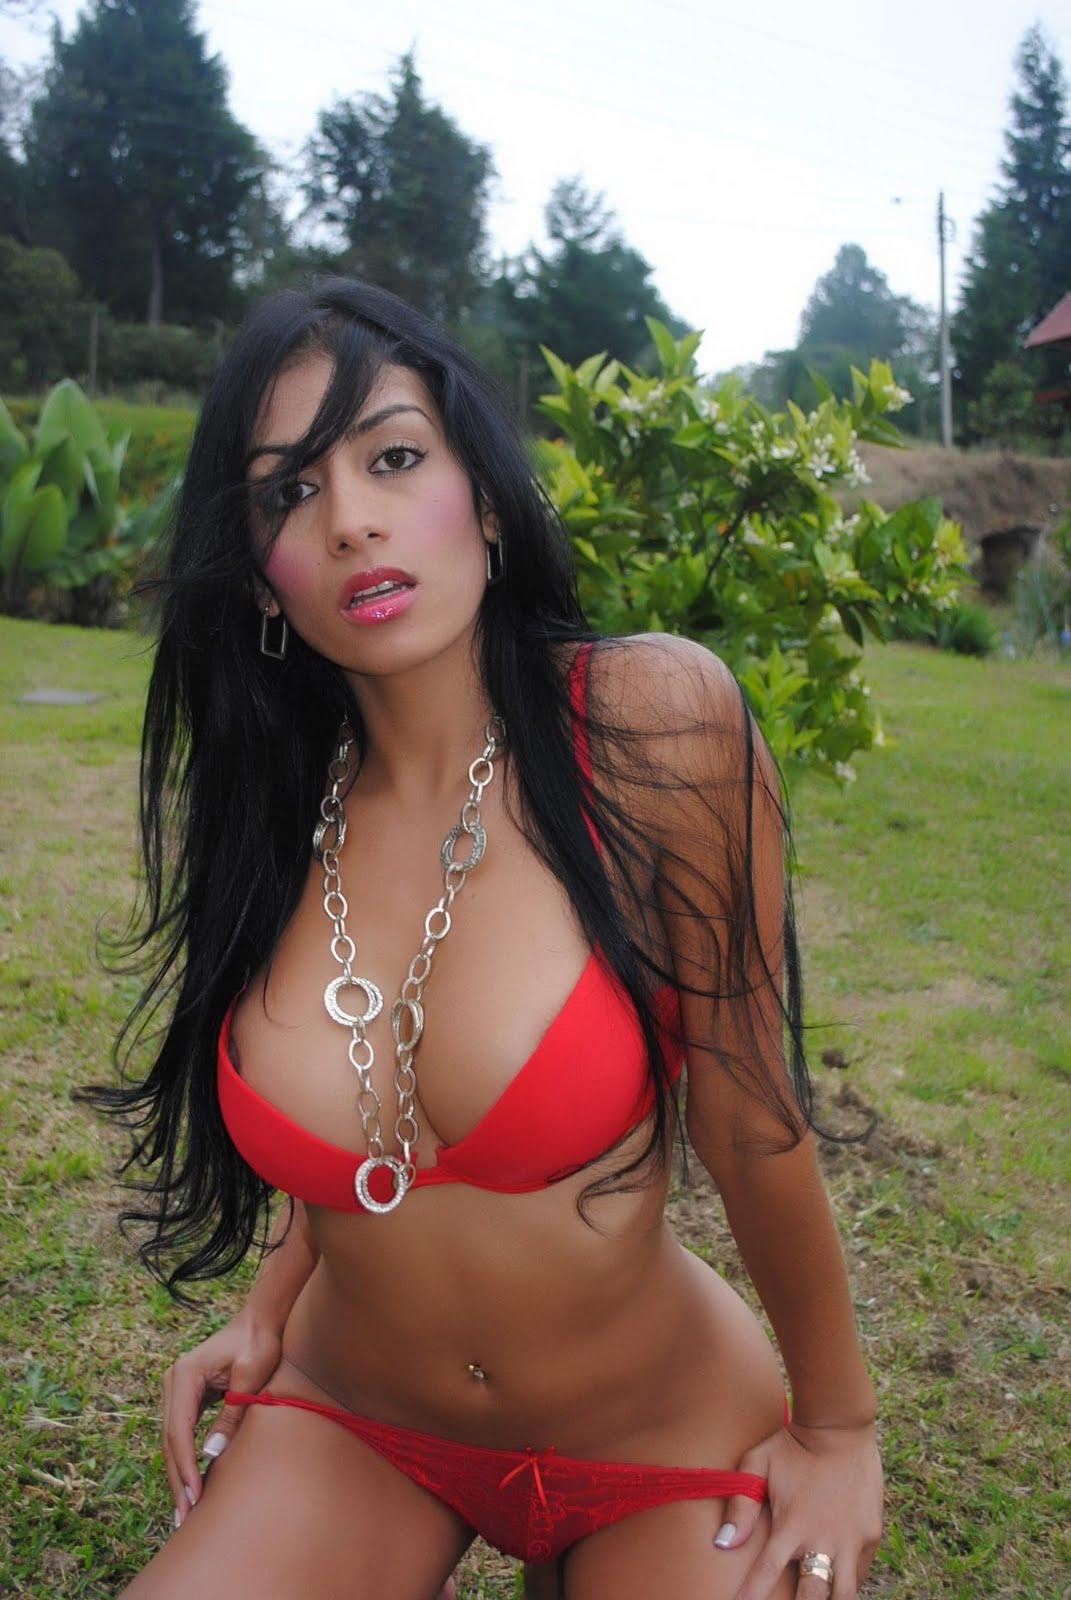 Travesti Colombiana Teniendo Sexo - YouPorncom